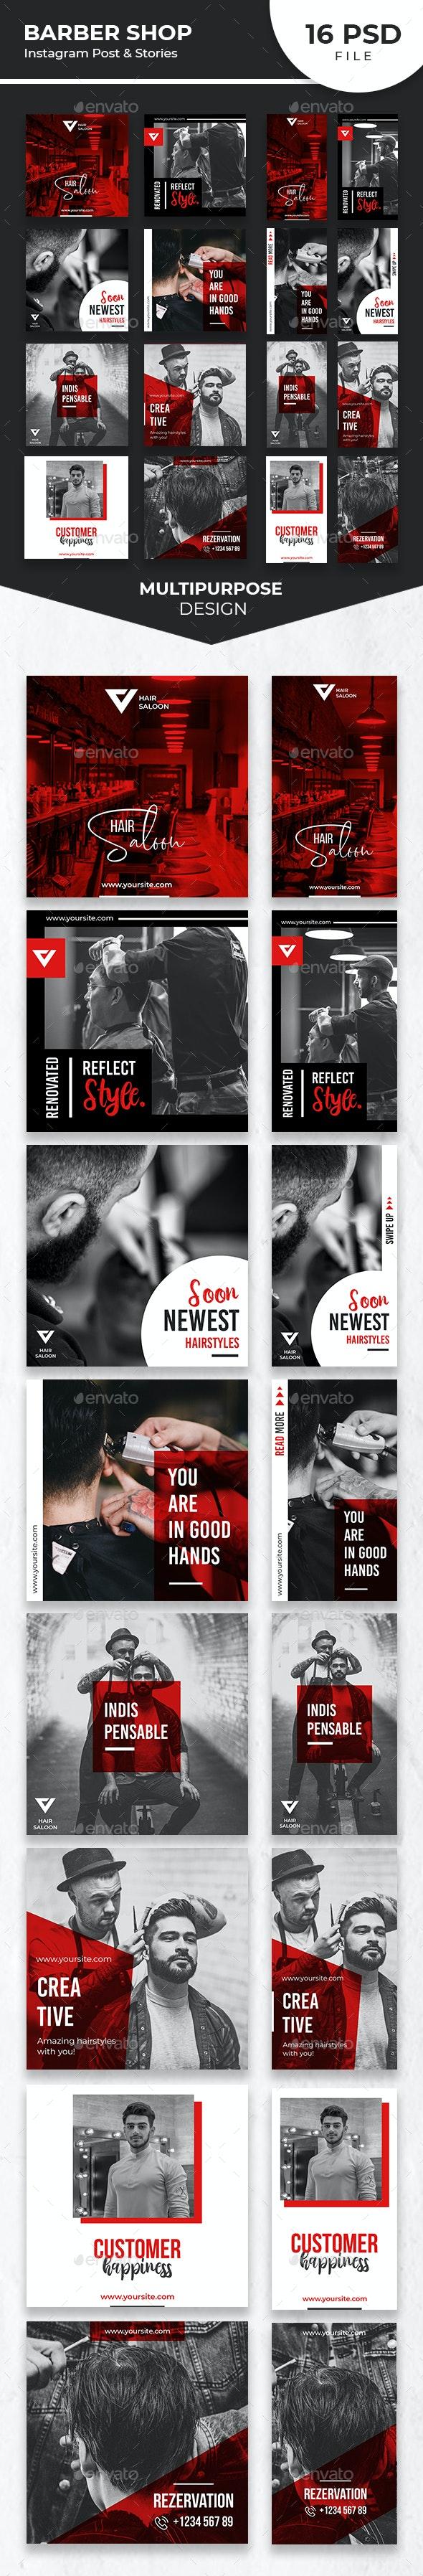 Barber Shop Instagram Post and Stories - Social Media Web Elements